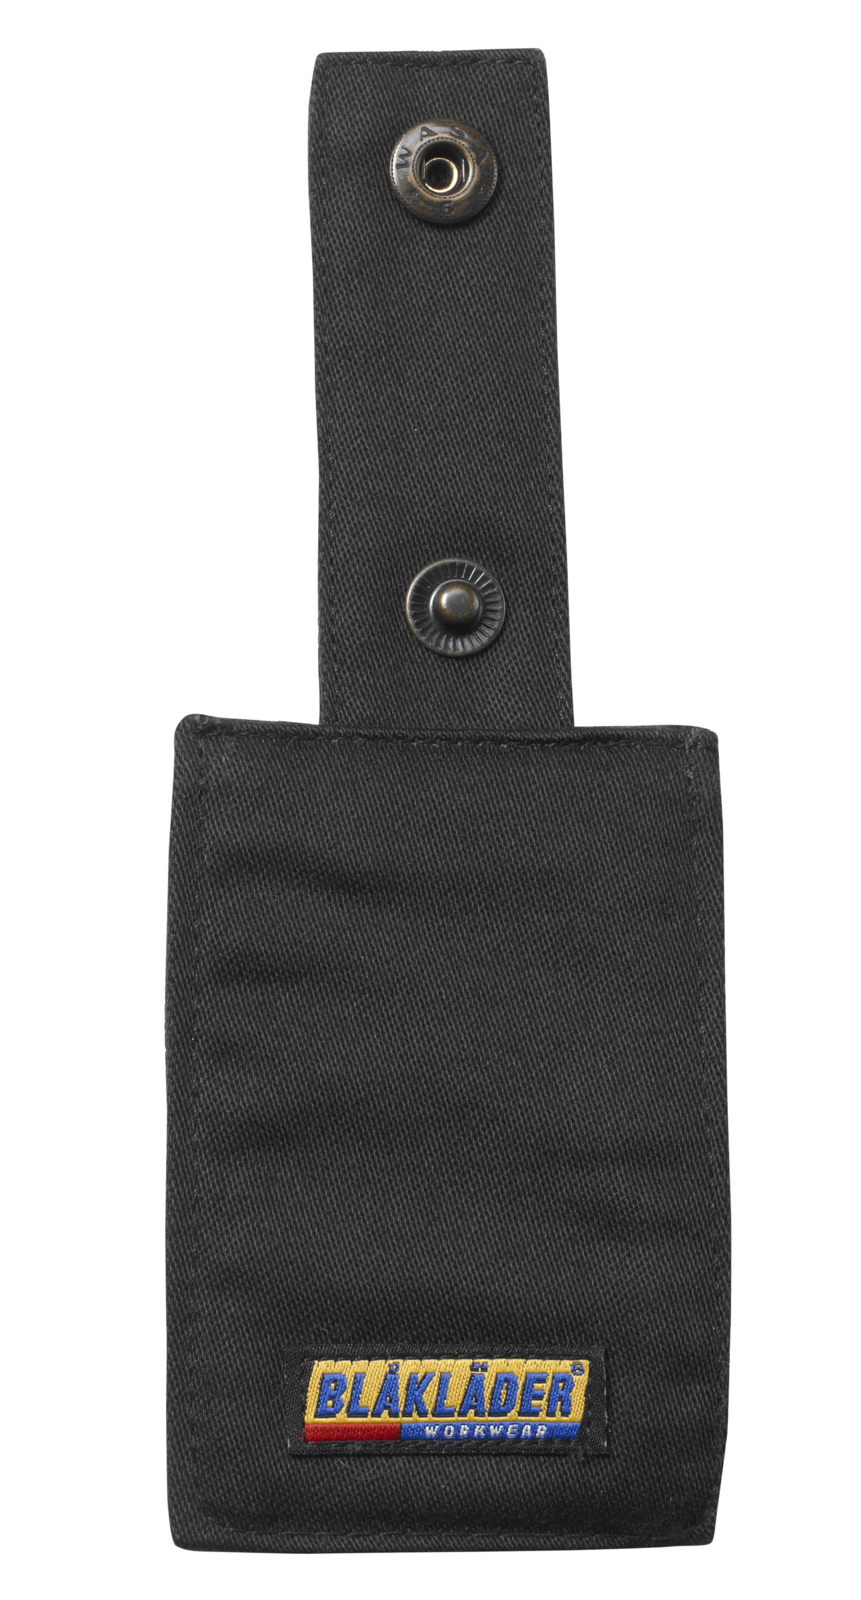 Blaklader ID-kaarthouders 21081507 Vlamvertragend zwart(9900)